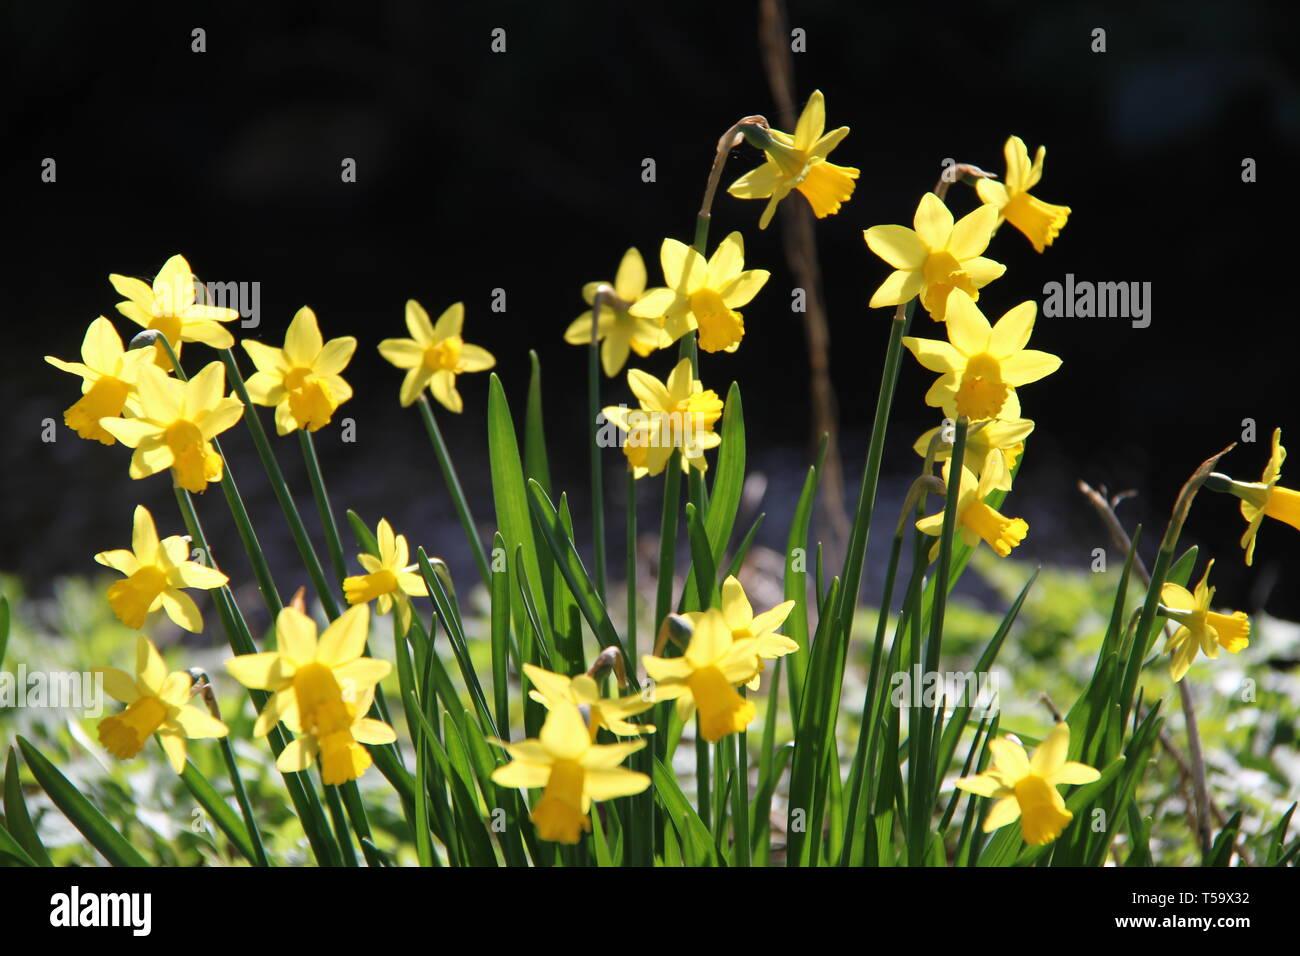 Osterglocke Narzisse gelb blühen Blumen Frühling - Stock Image